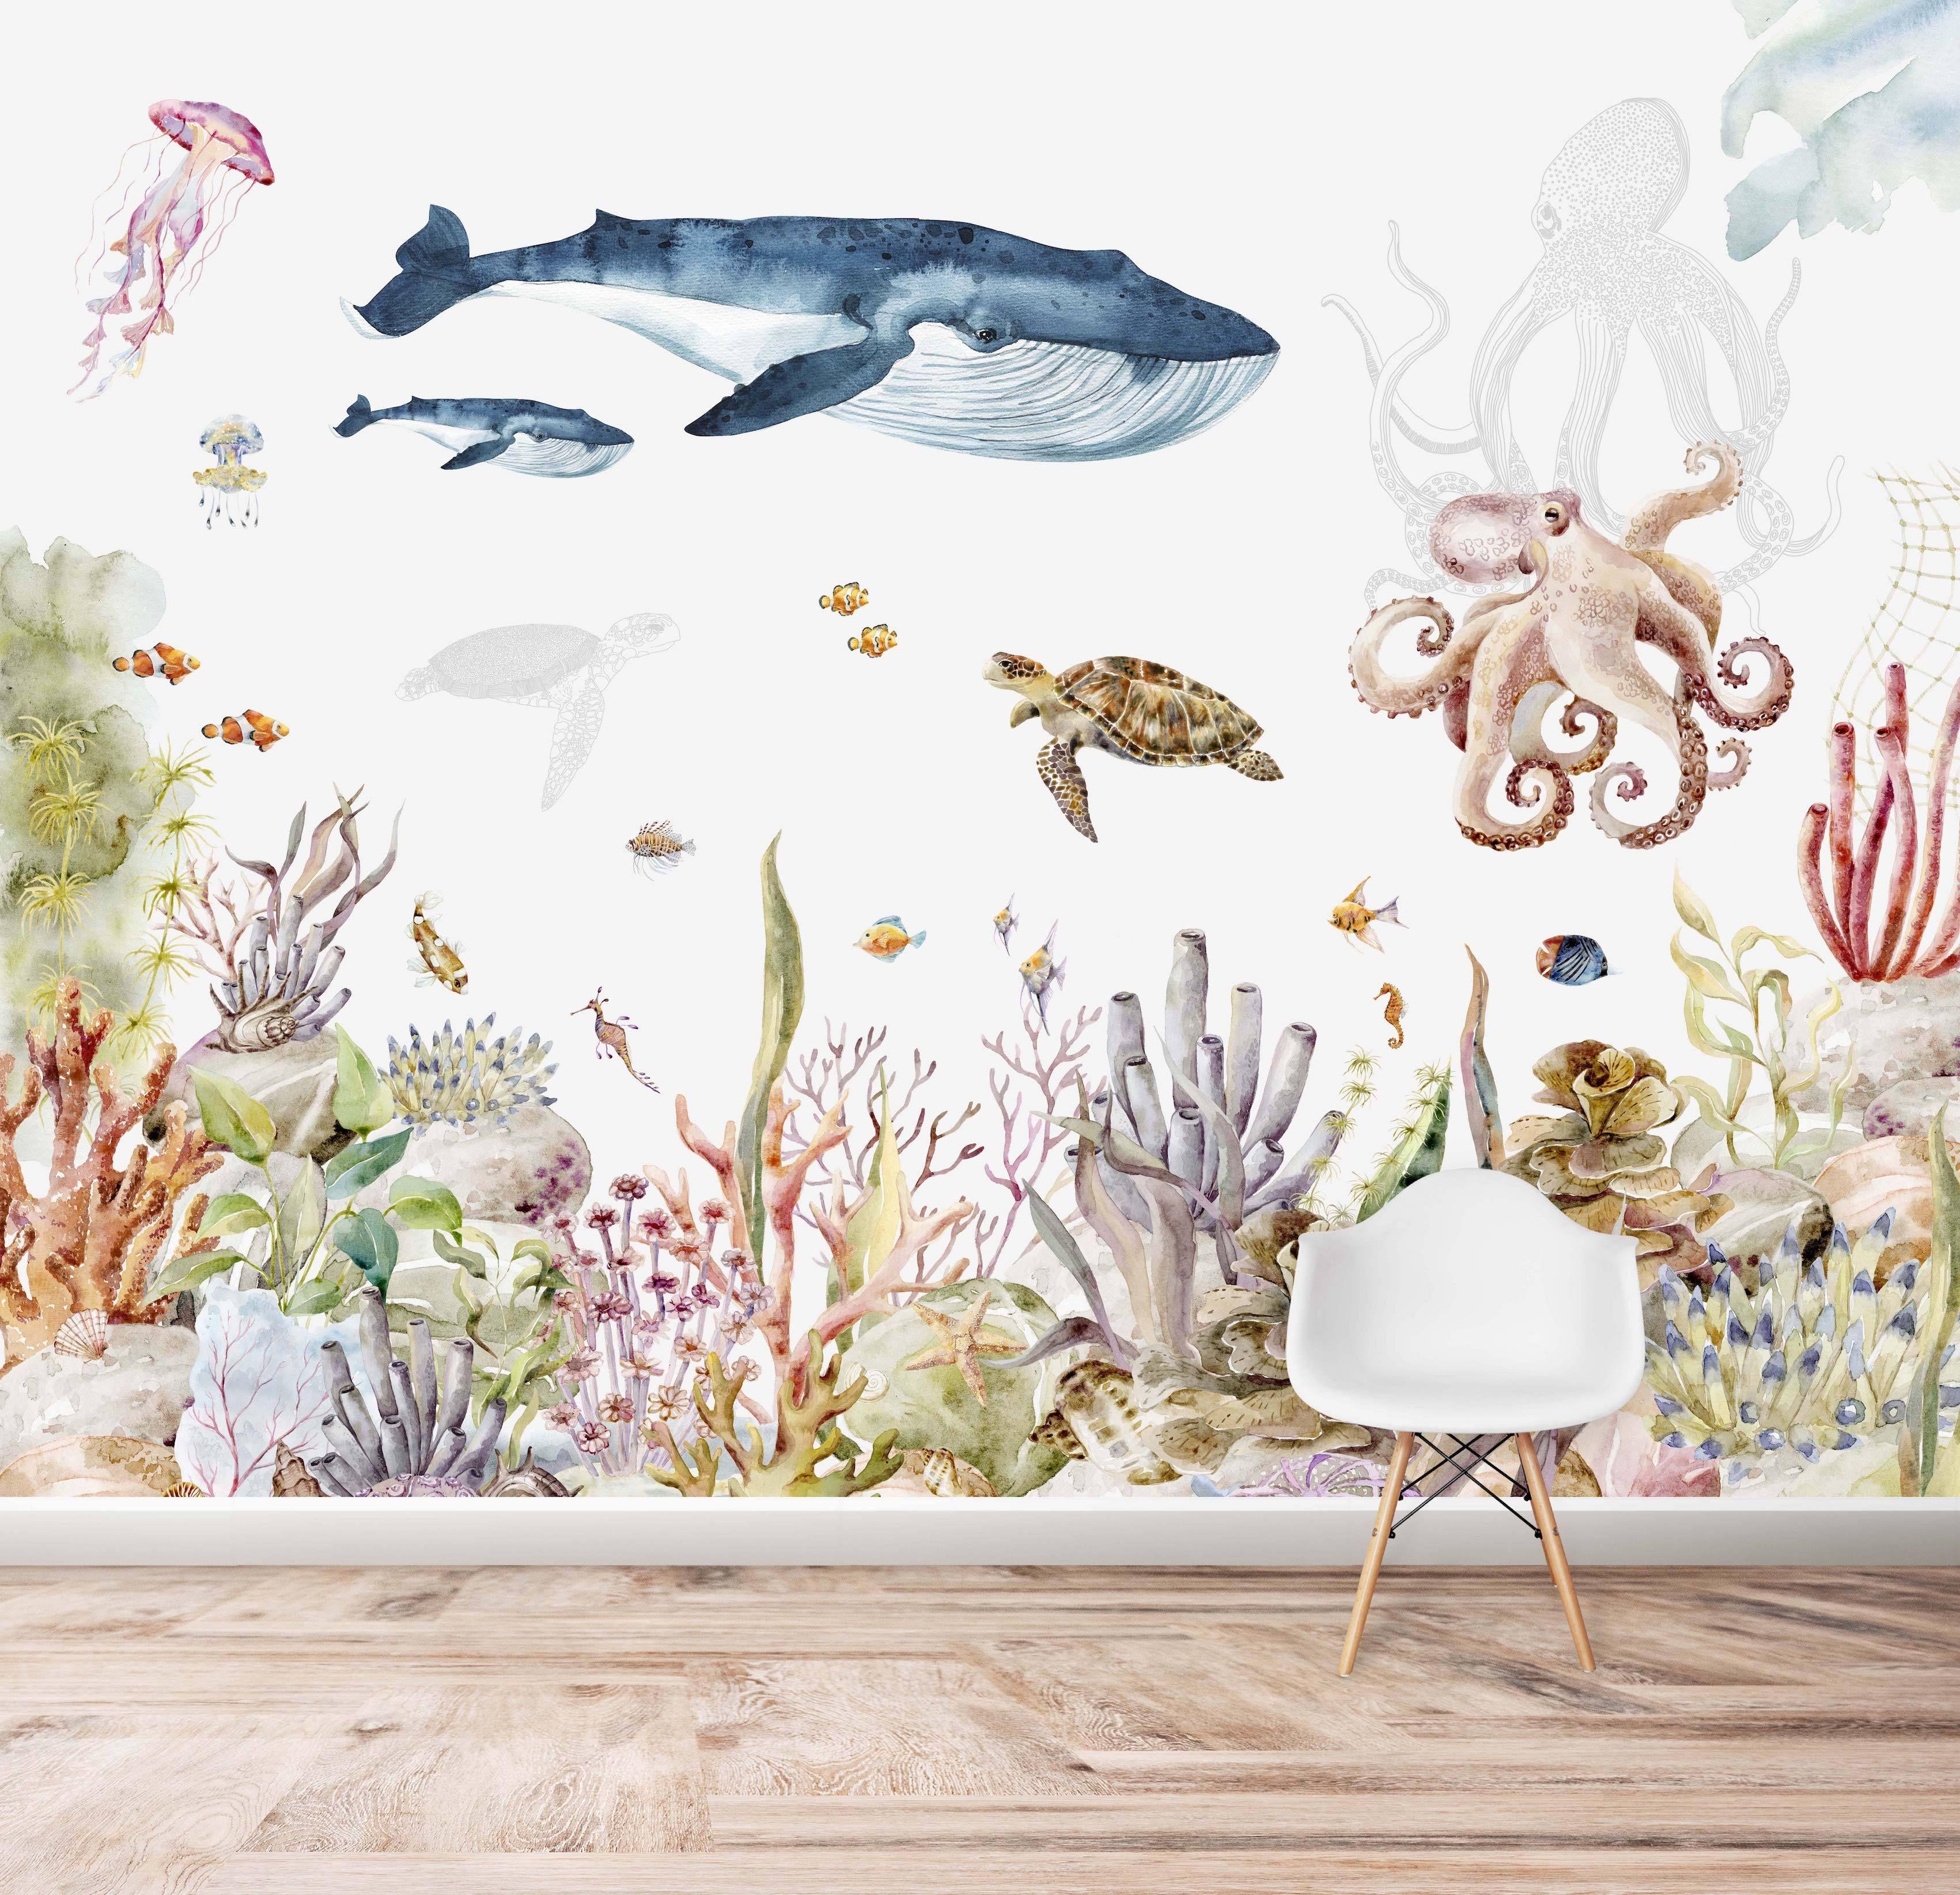 Under The Sea Wallpaper | Watercolour | Mural